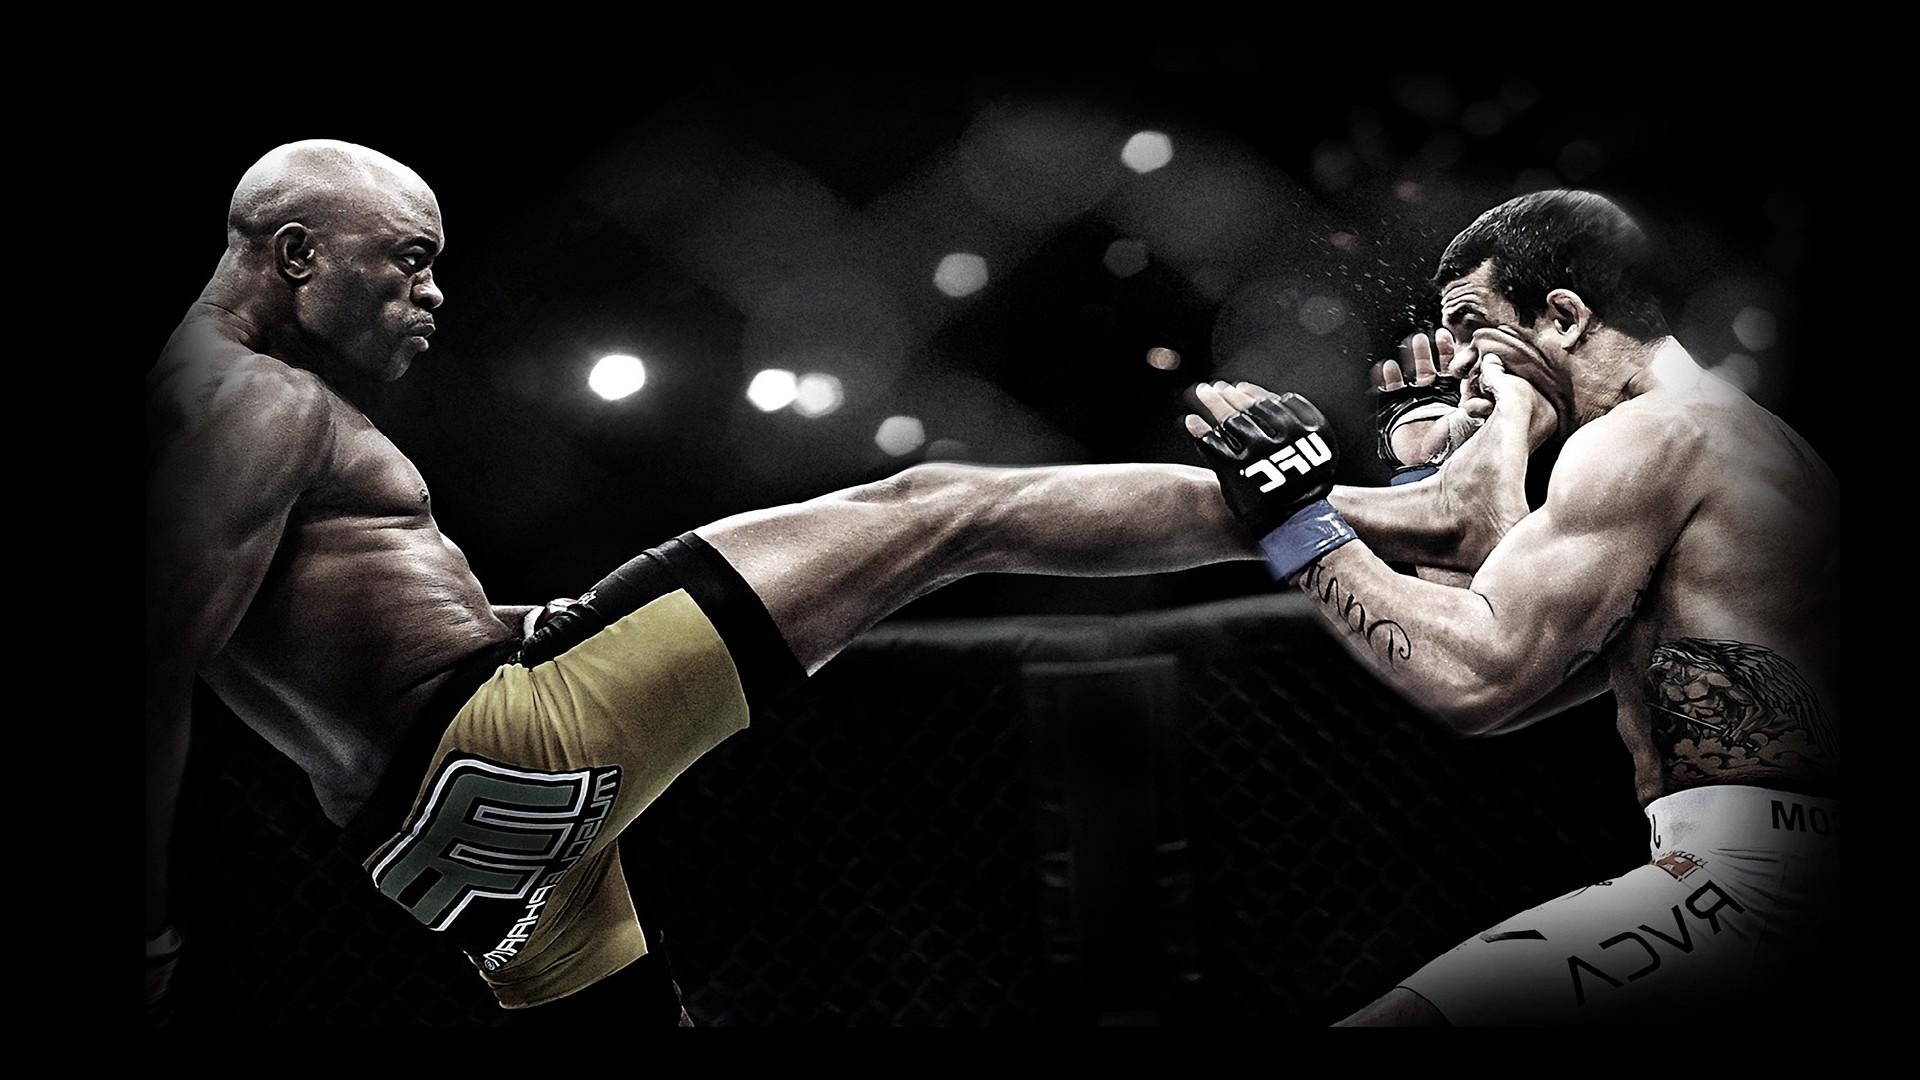 Category : Mixed Wallpapers » MMA Awsome Kick -px